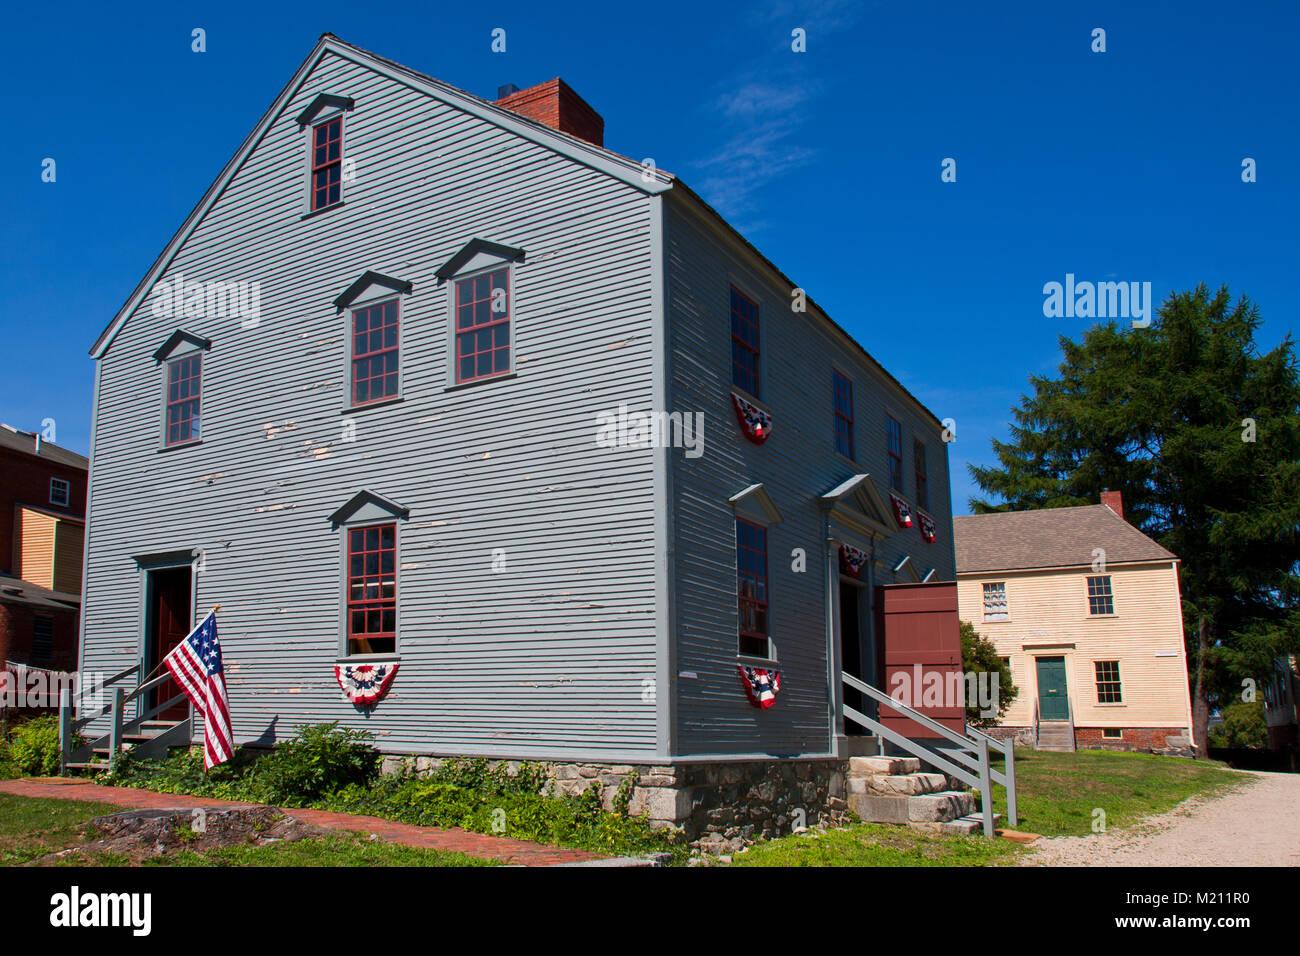 Strawbery Banke Museum, historic restoration, Portsmouth New Hampshire, Wheelright House (bluegrey) Jefferson Street, - Stock Image